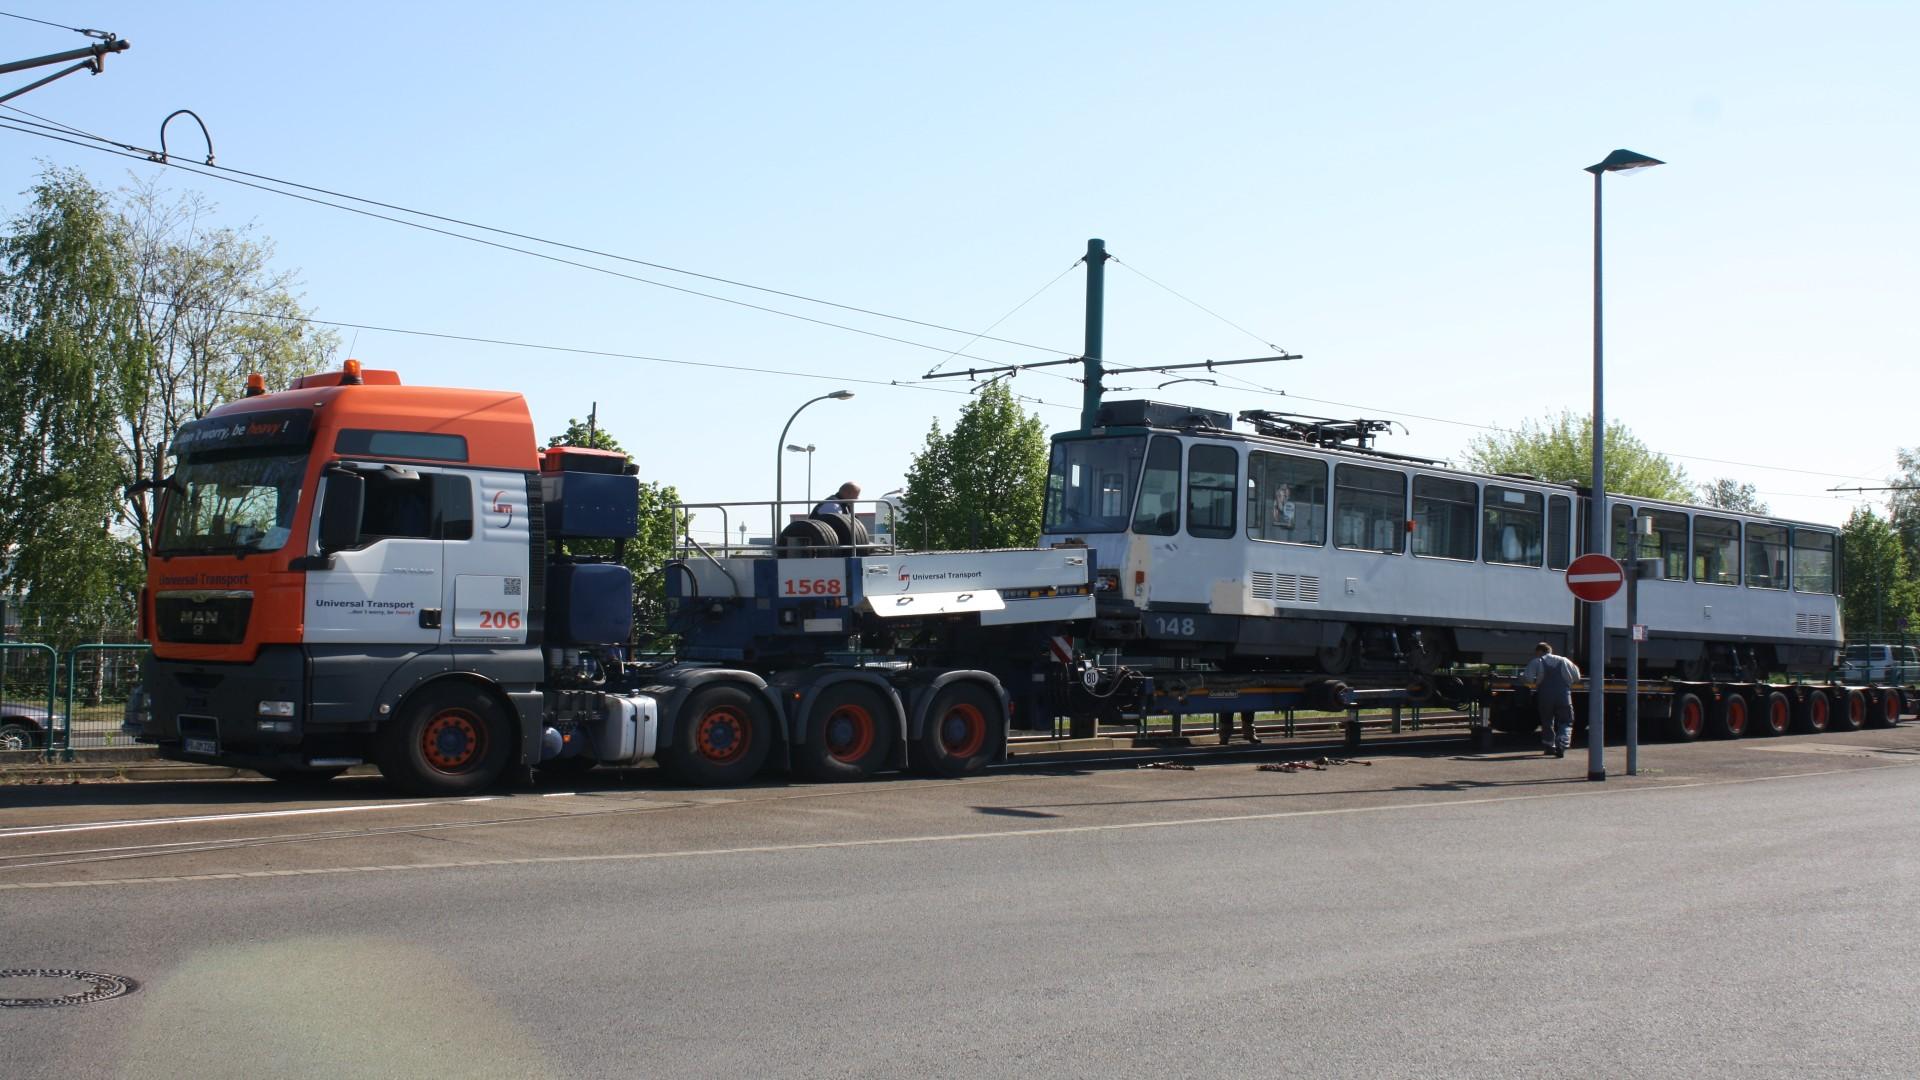 Abtransport Tatra zur Instandsetzung, © ViP